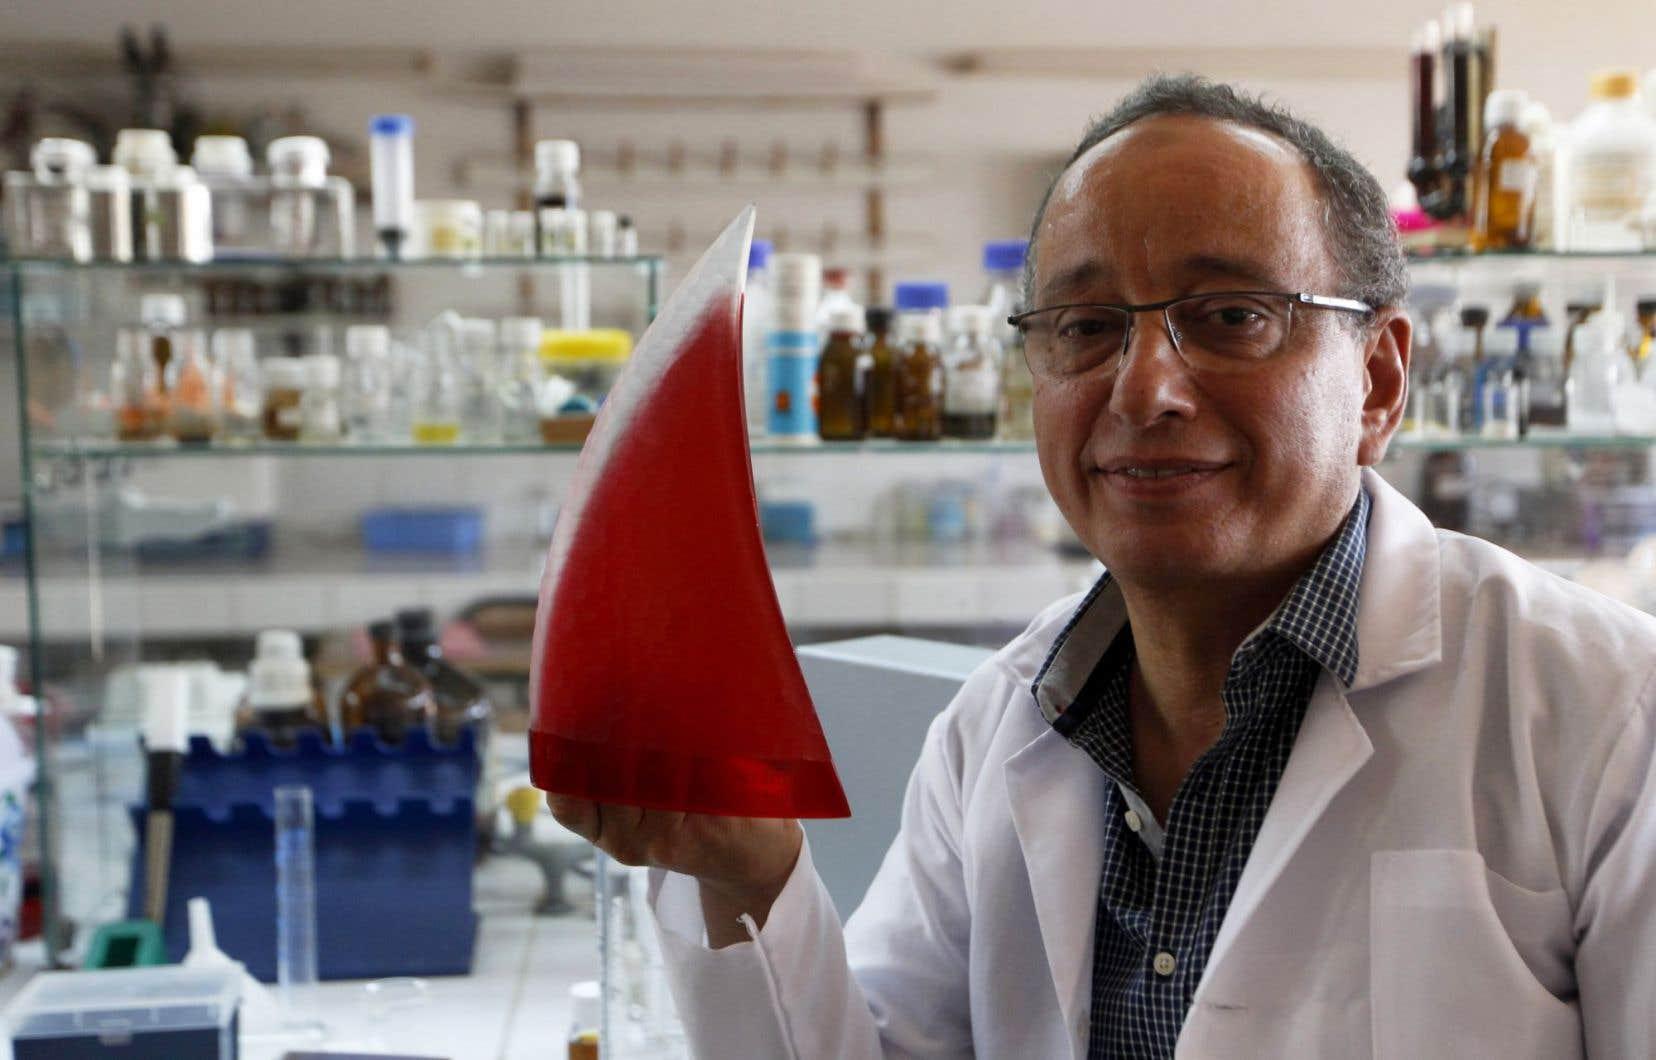 Le chercheur marocain Adnane Remmal